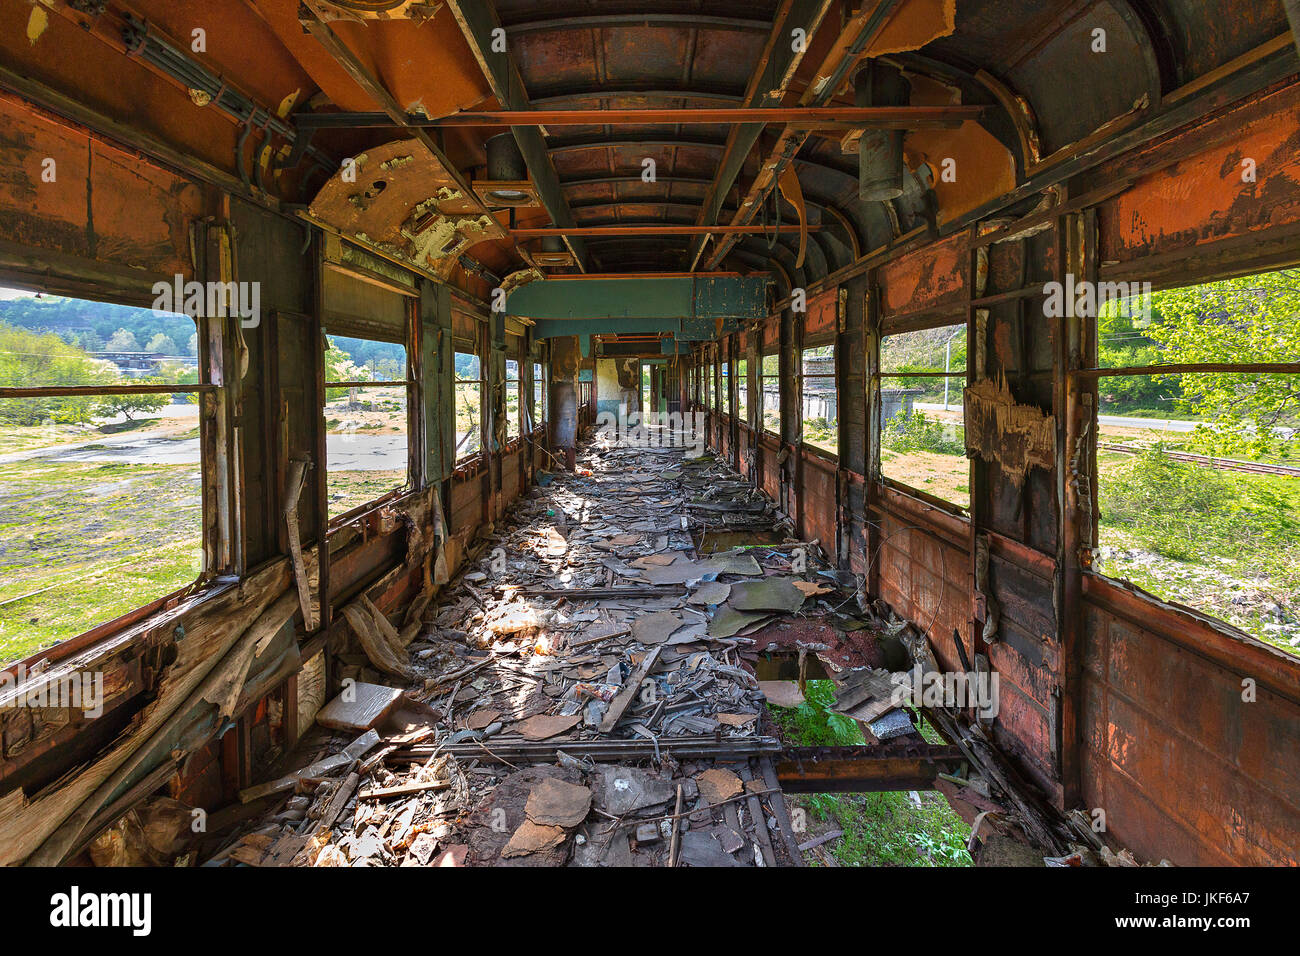 Abandoned Old Soviet Train Wagon In Georgia, Caucasus